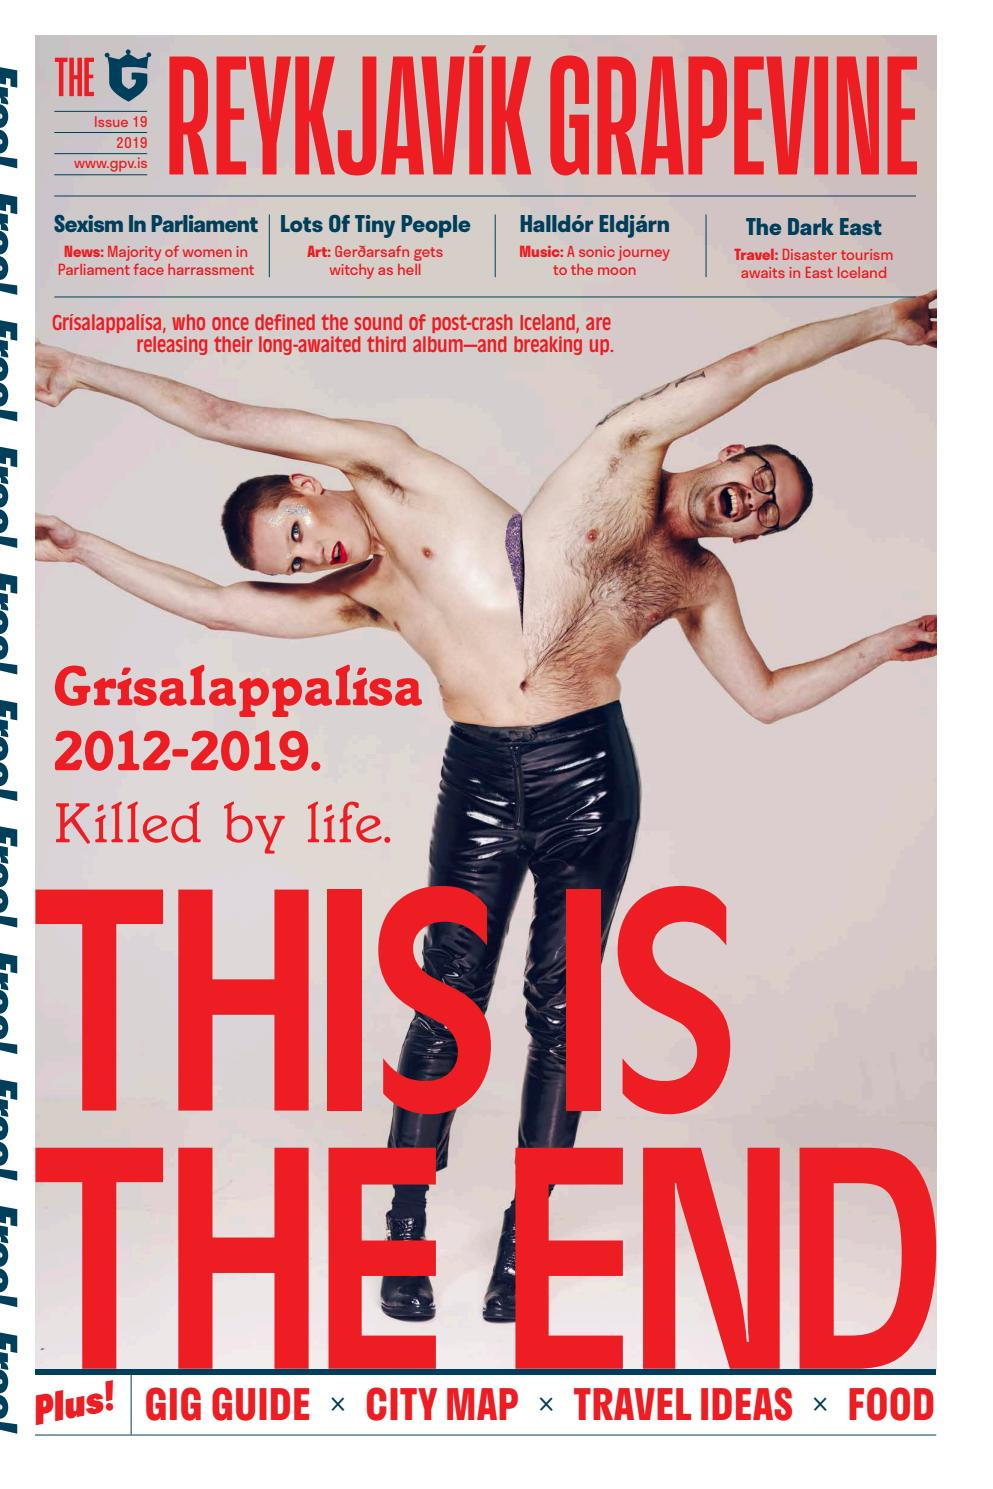 Issue 19 2019 by Reykjavk Grapevine issuu